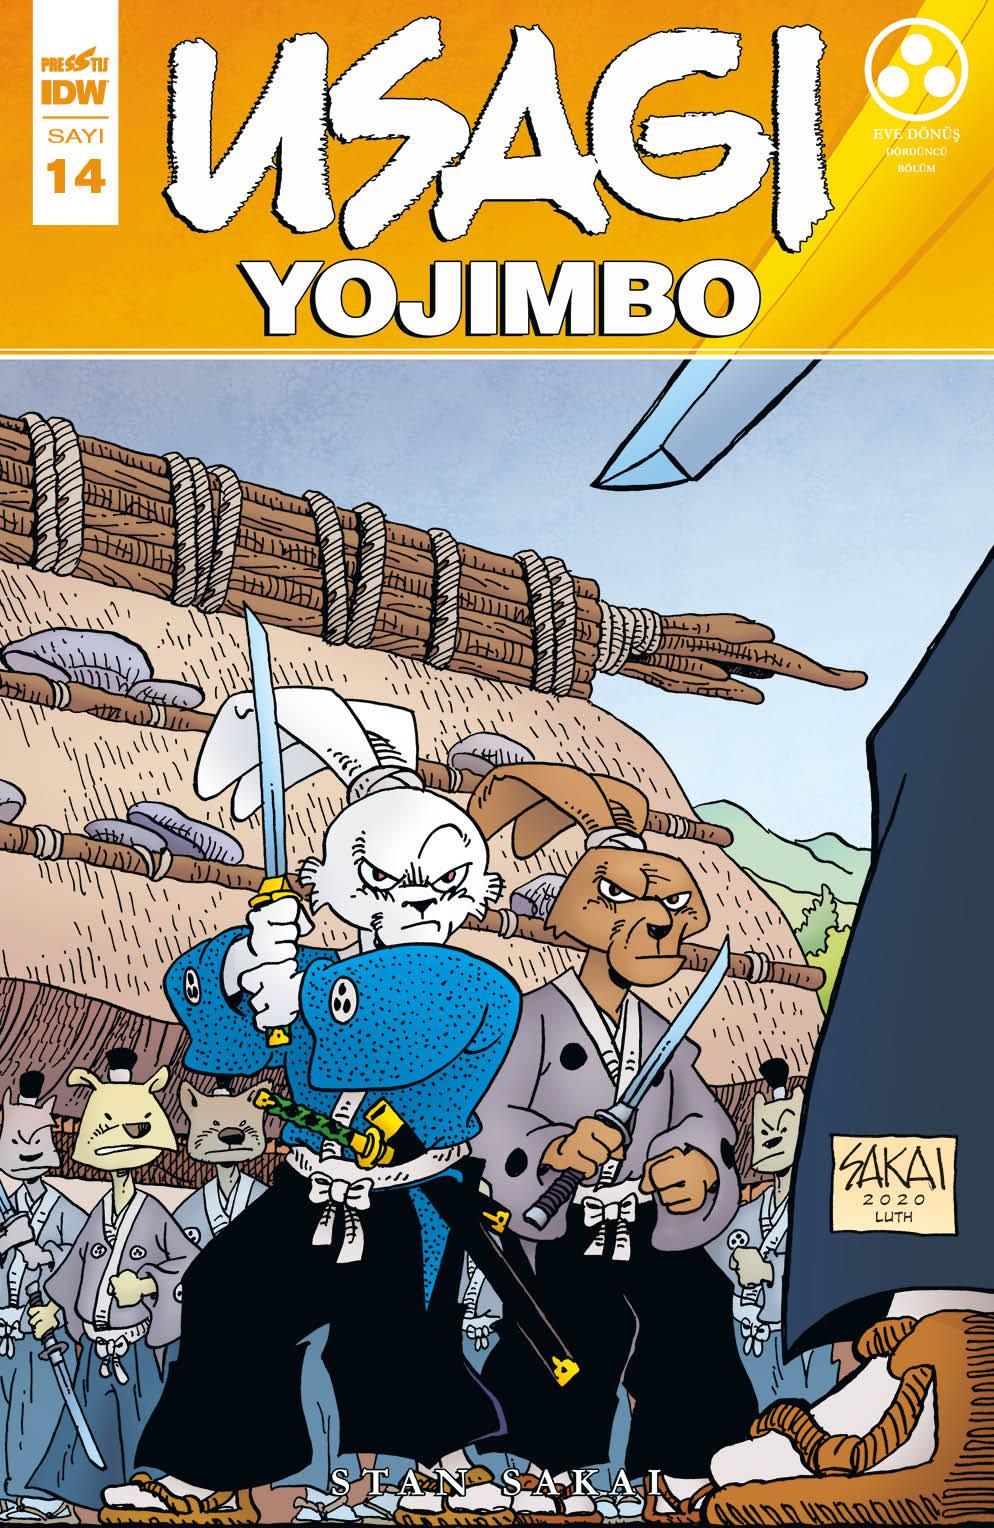 Usagi Yojimbo Sayı 14